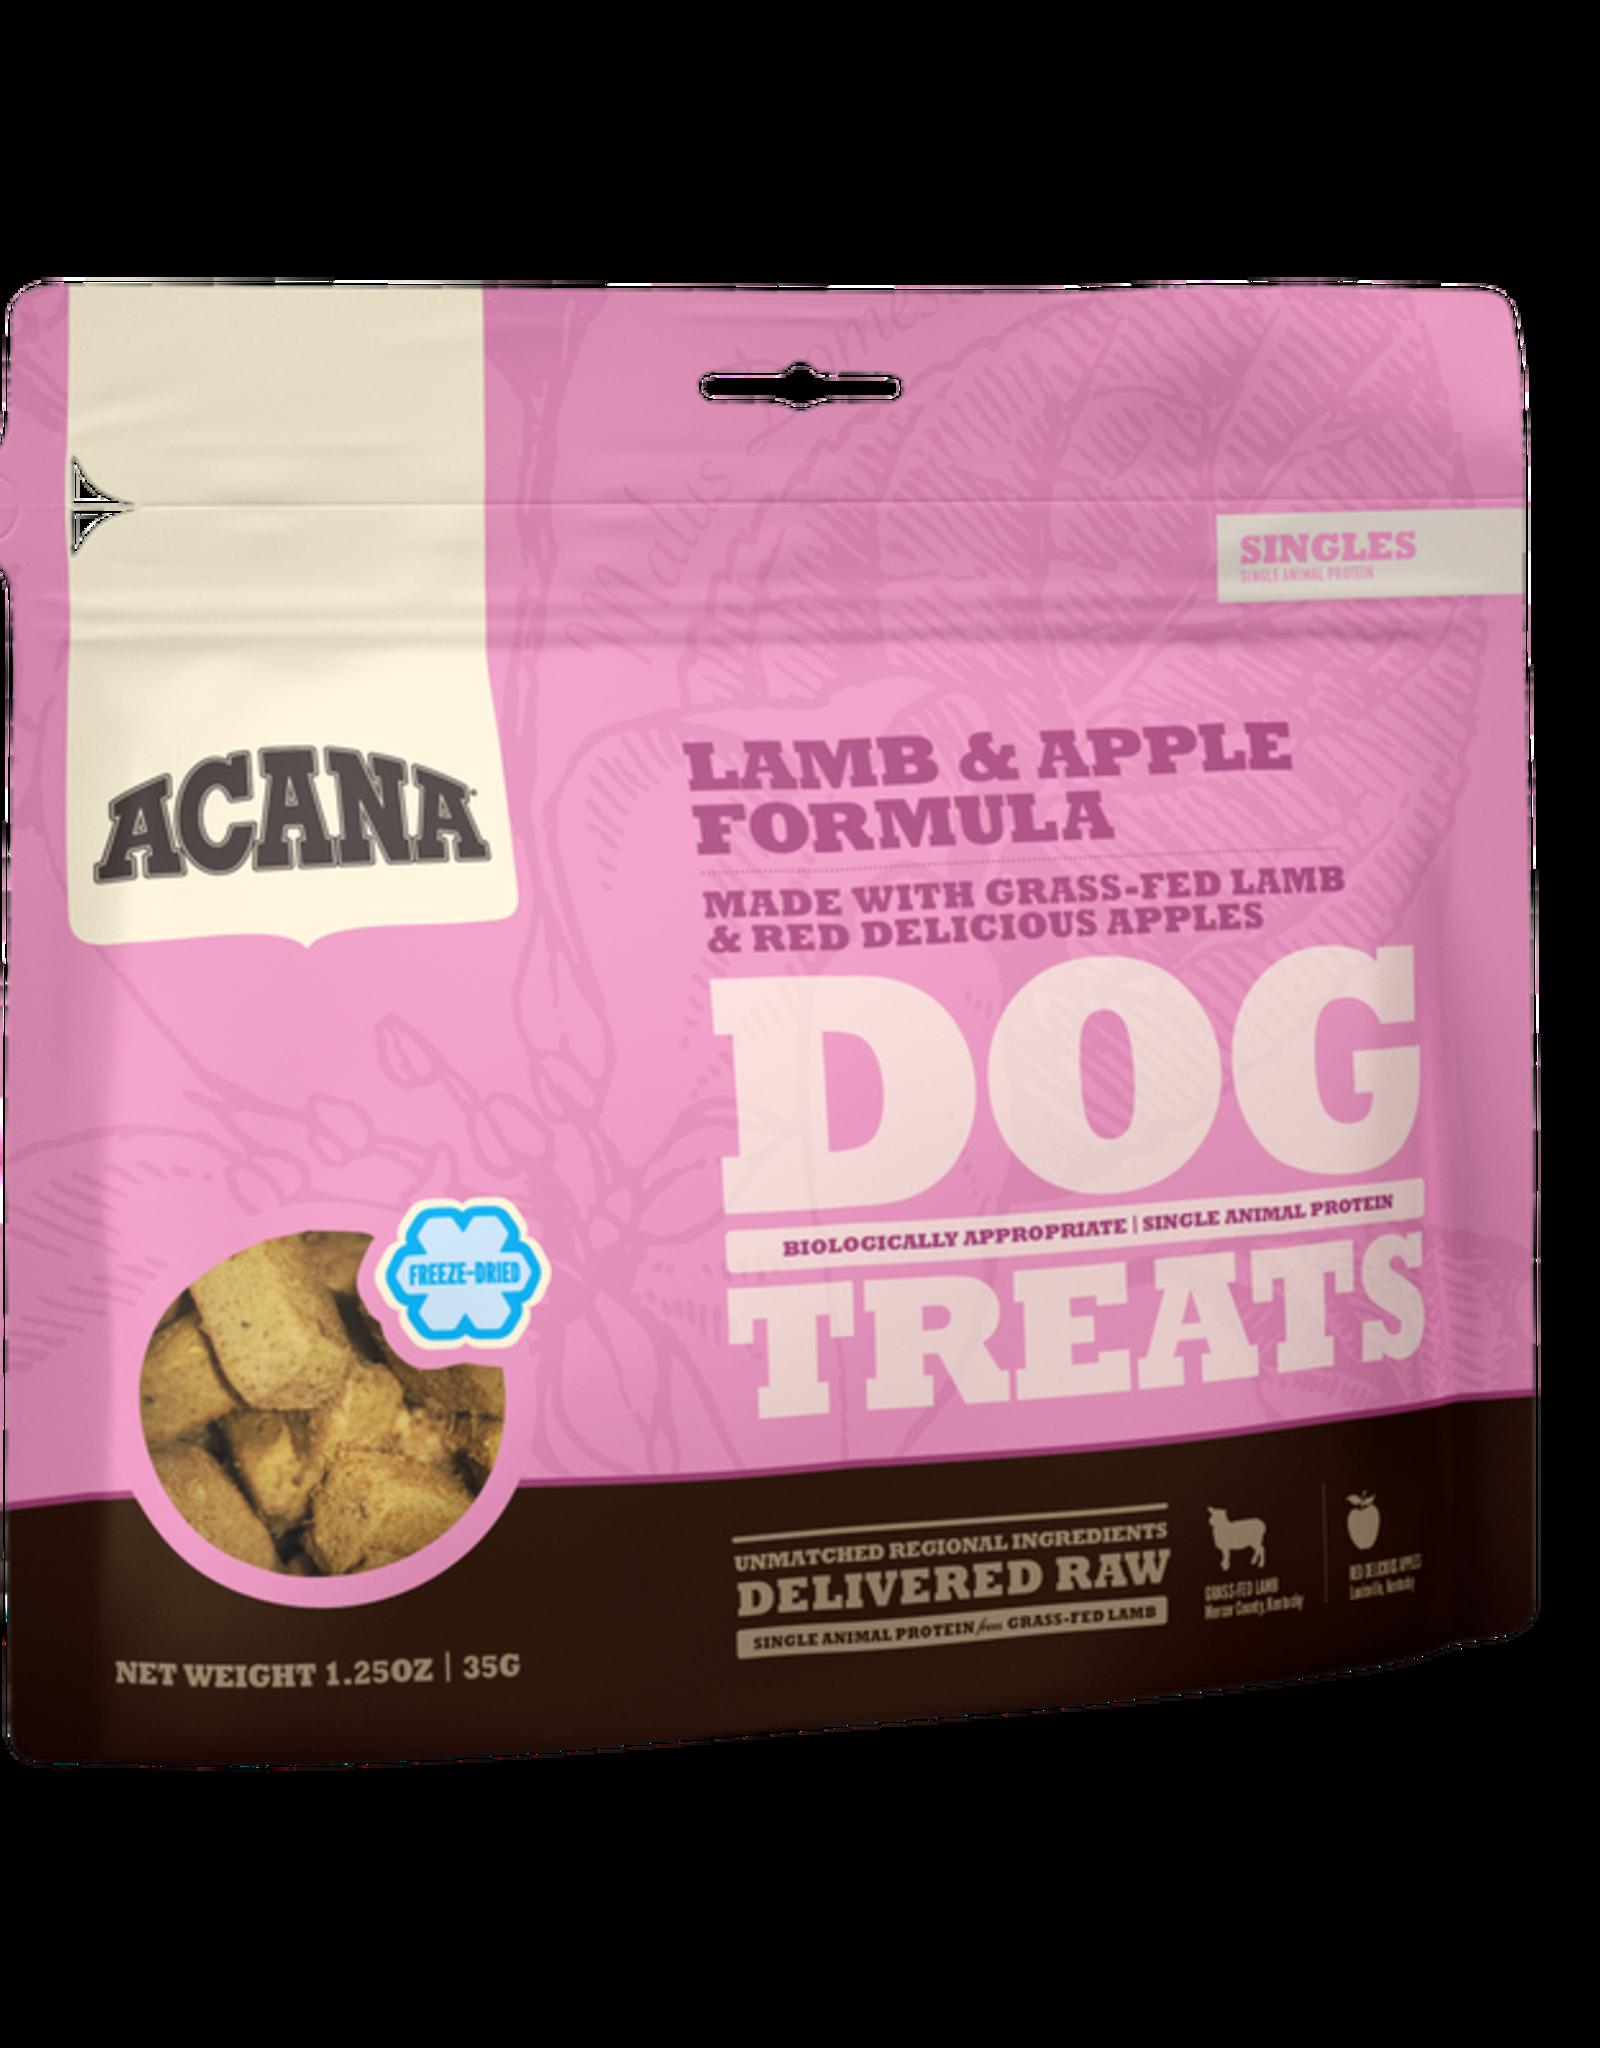 Acana Lamb & Apple Dog Treat 3.25oz